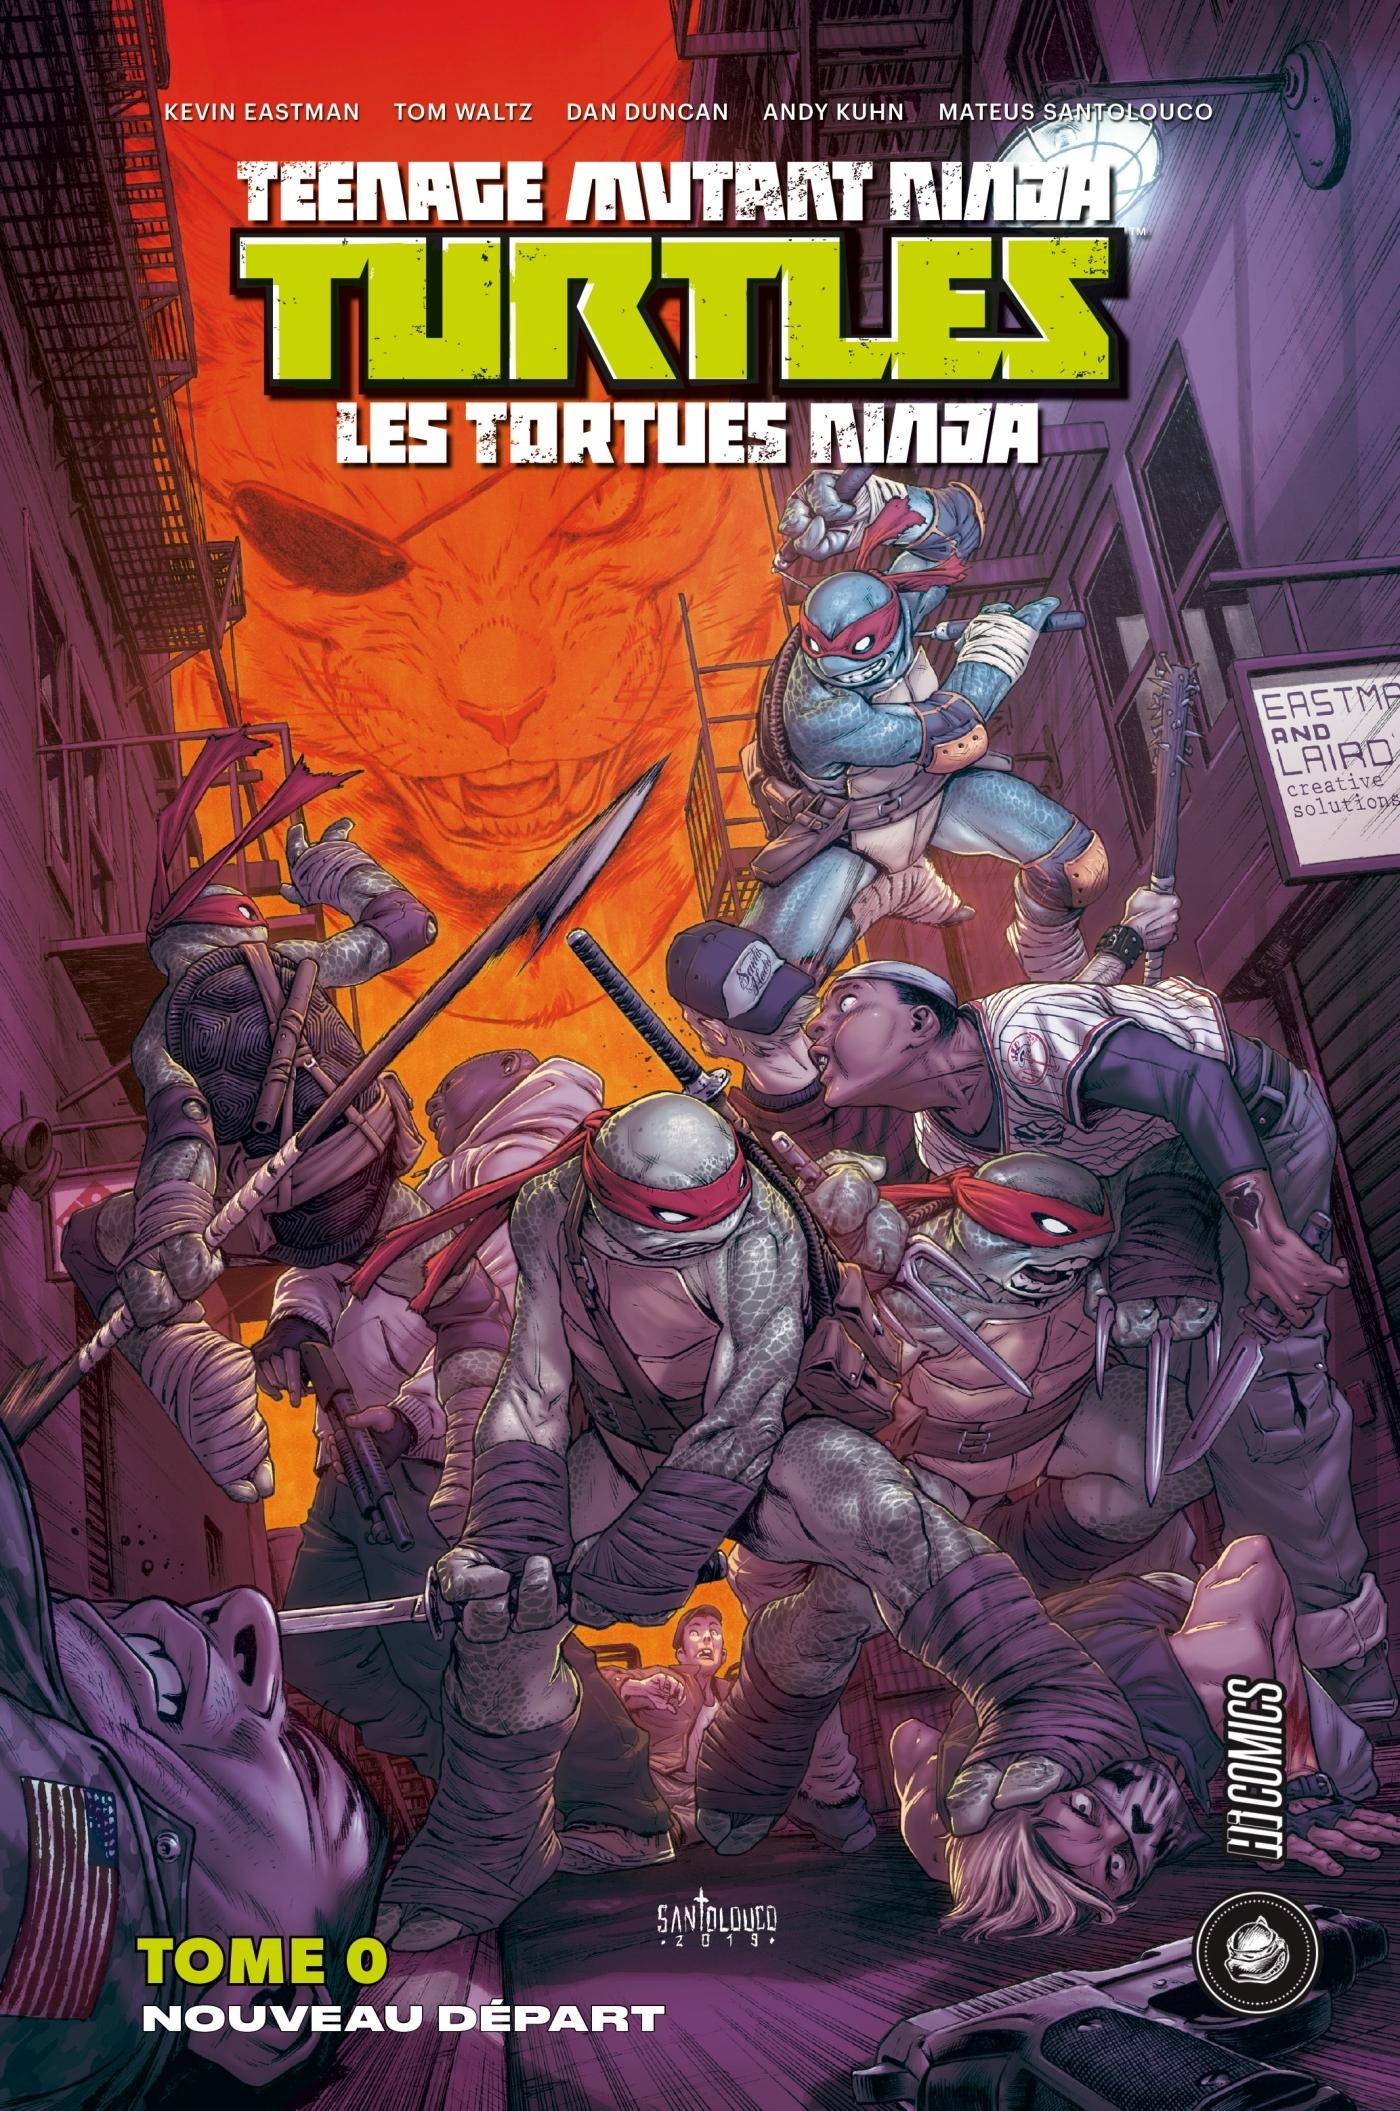 LES TORTUES NINJA - TMNT : NOUVEAU DEPART